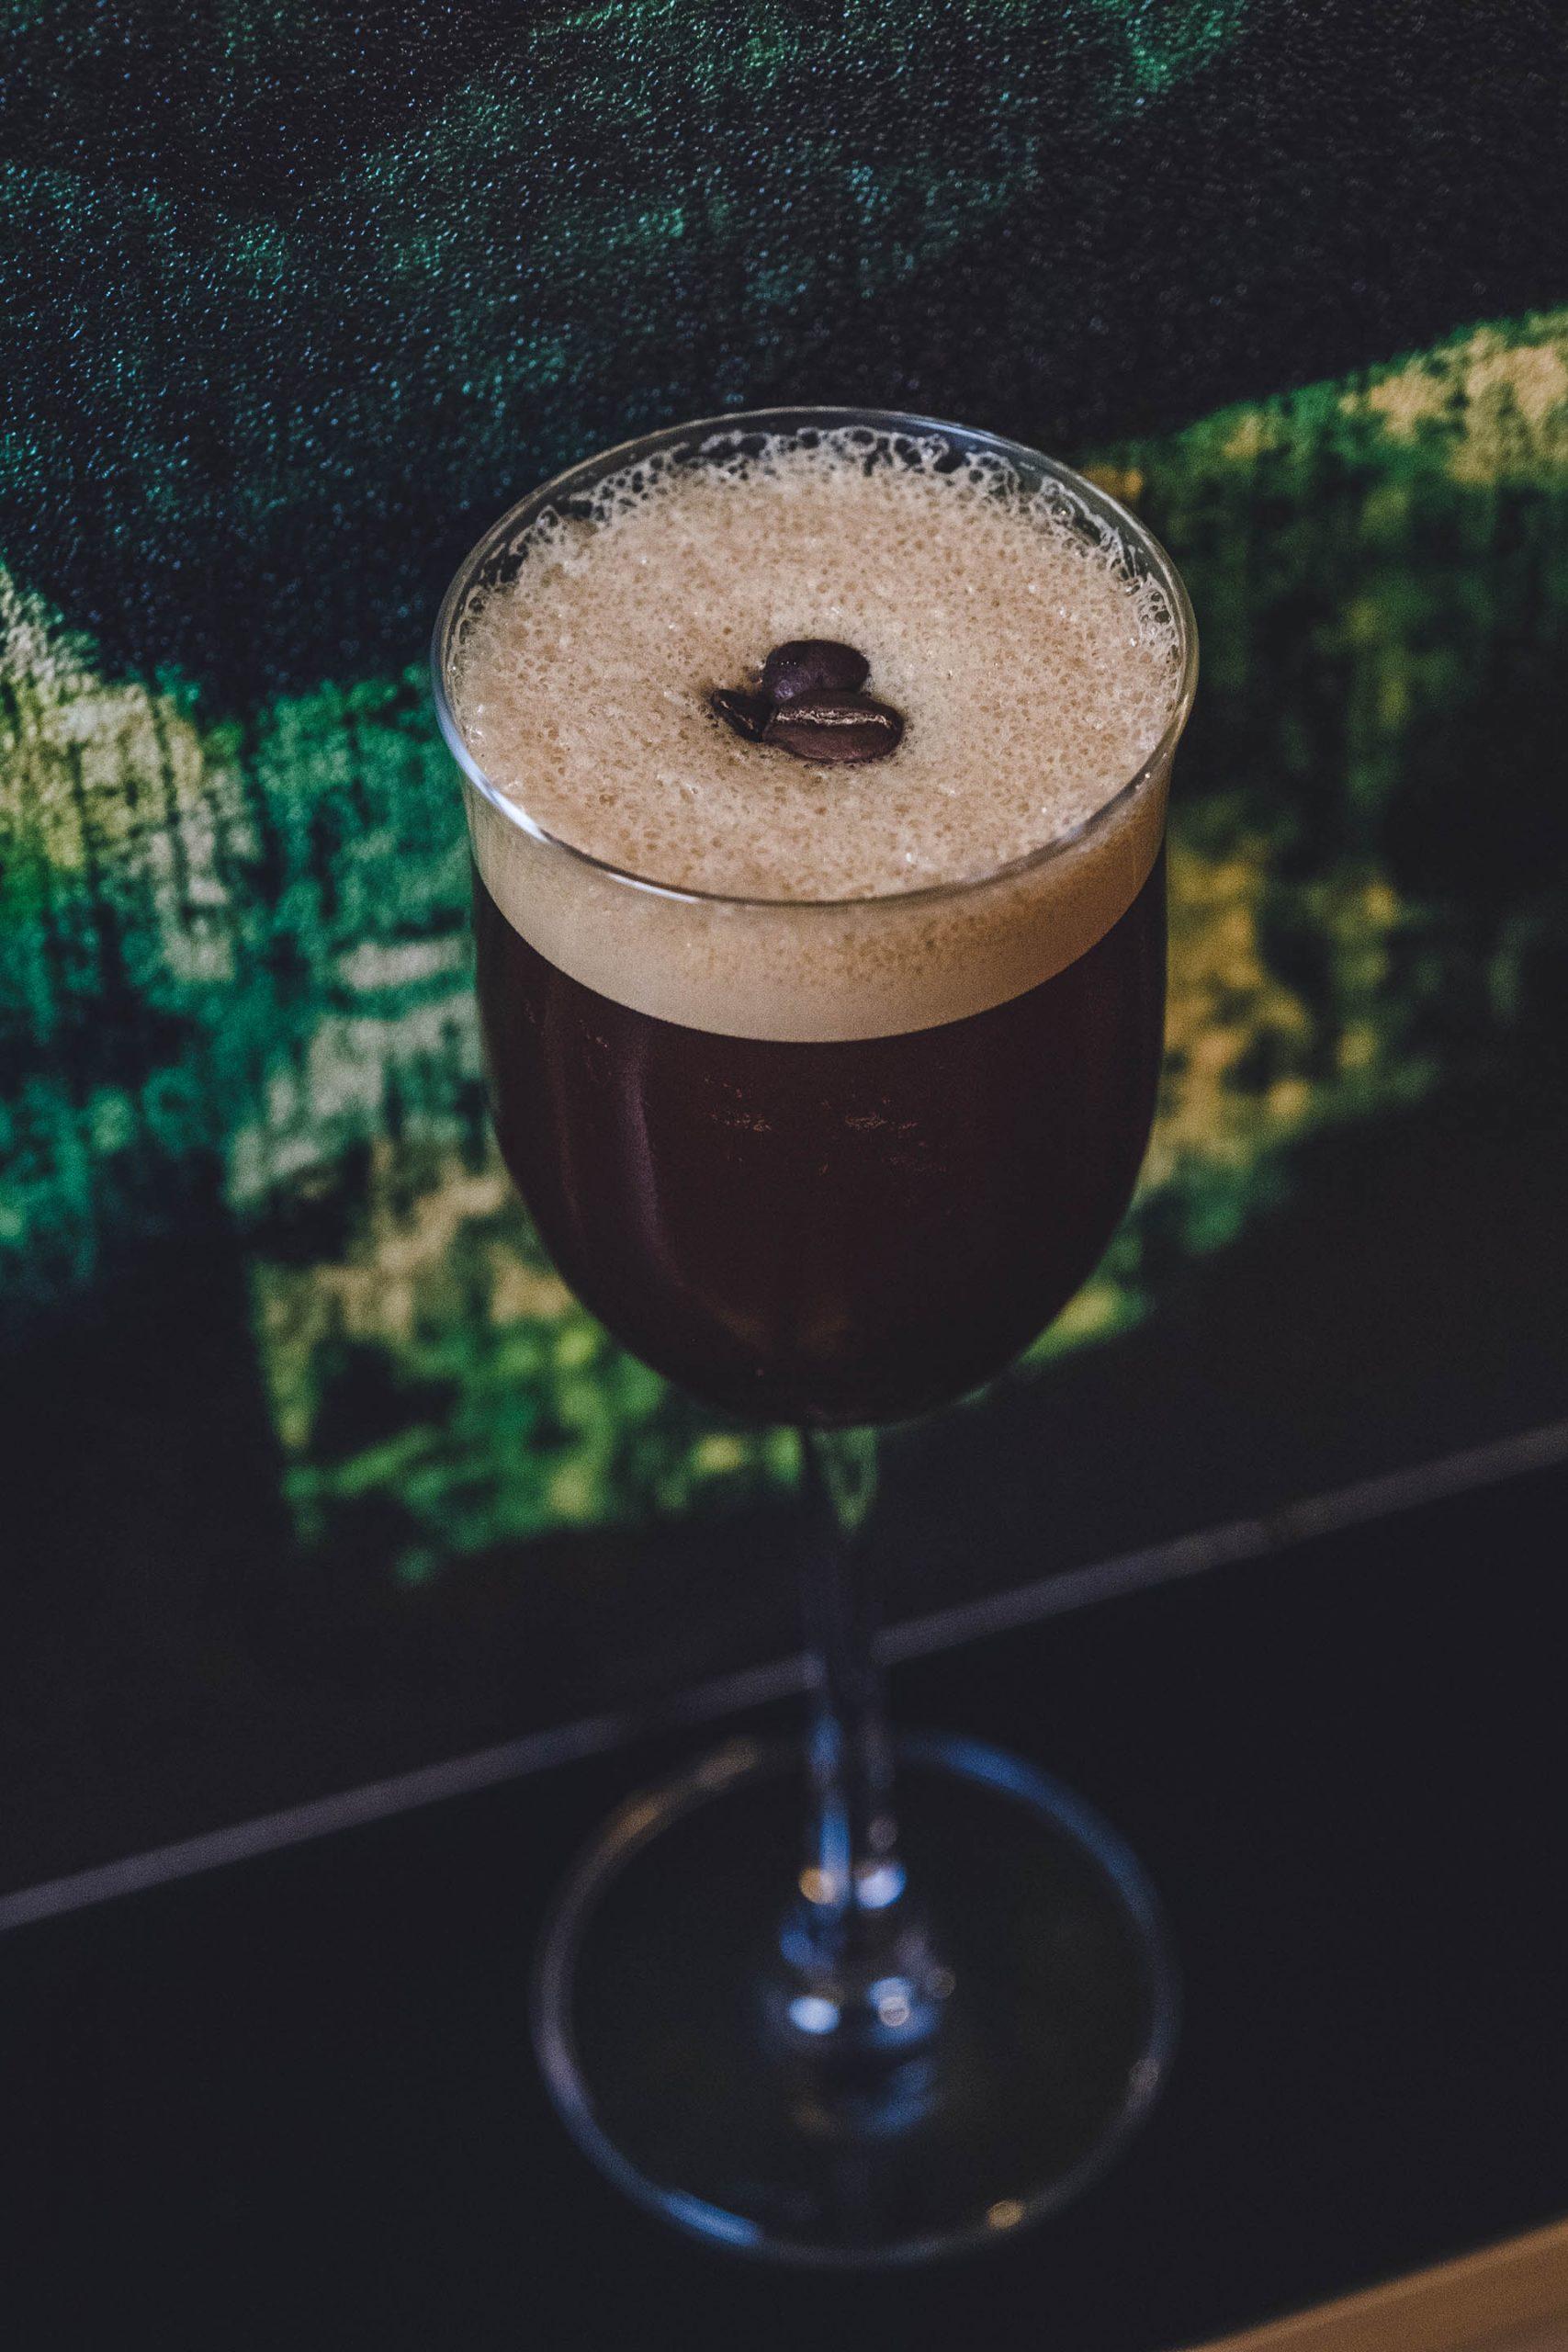 The espresso martini at Slippbarinn hip Reykjavik bar